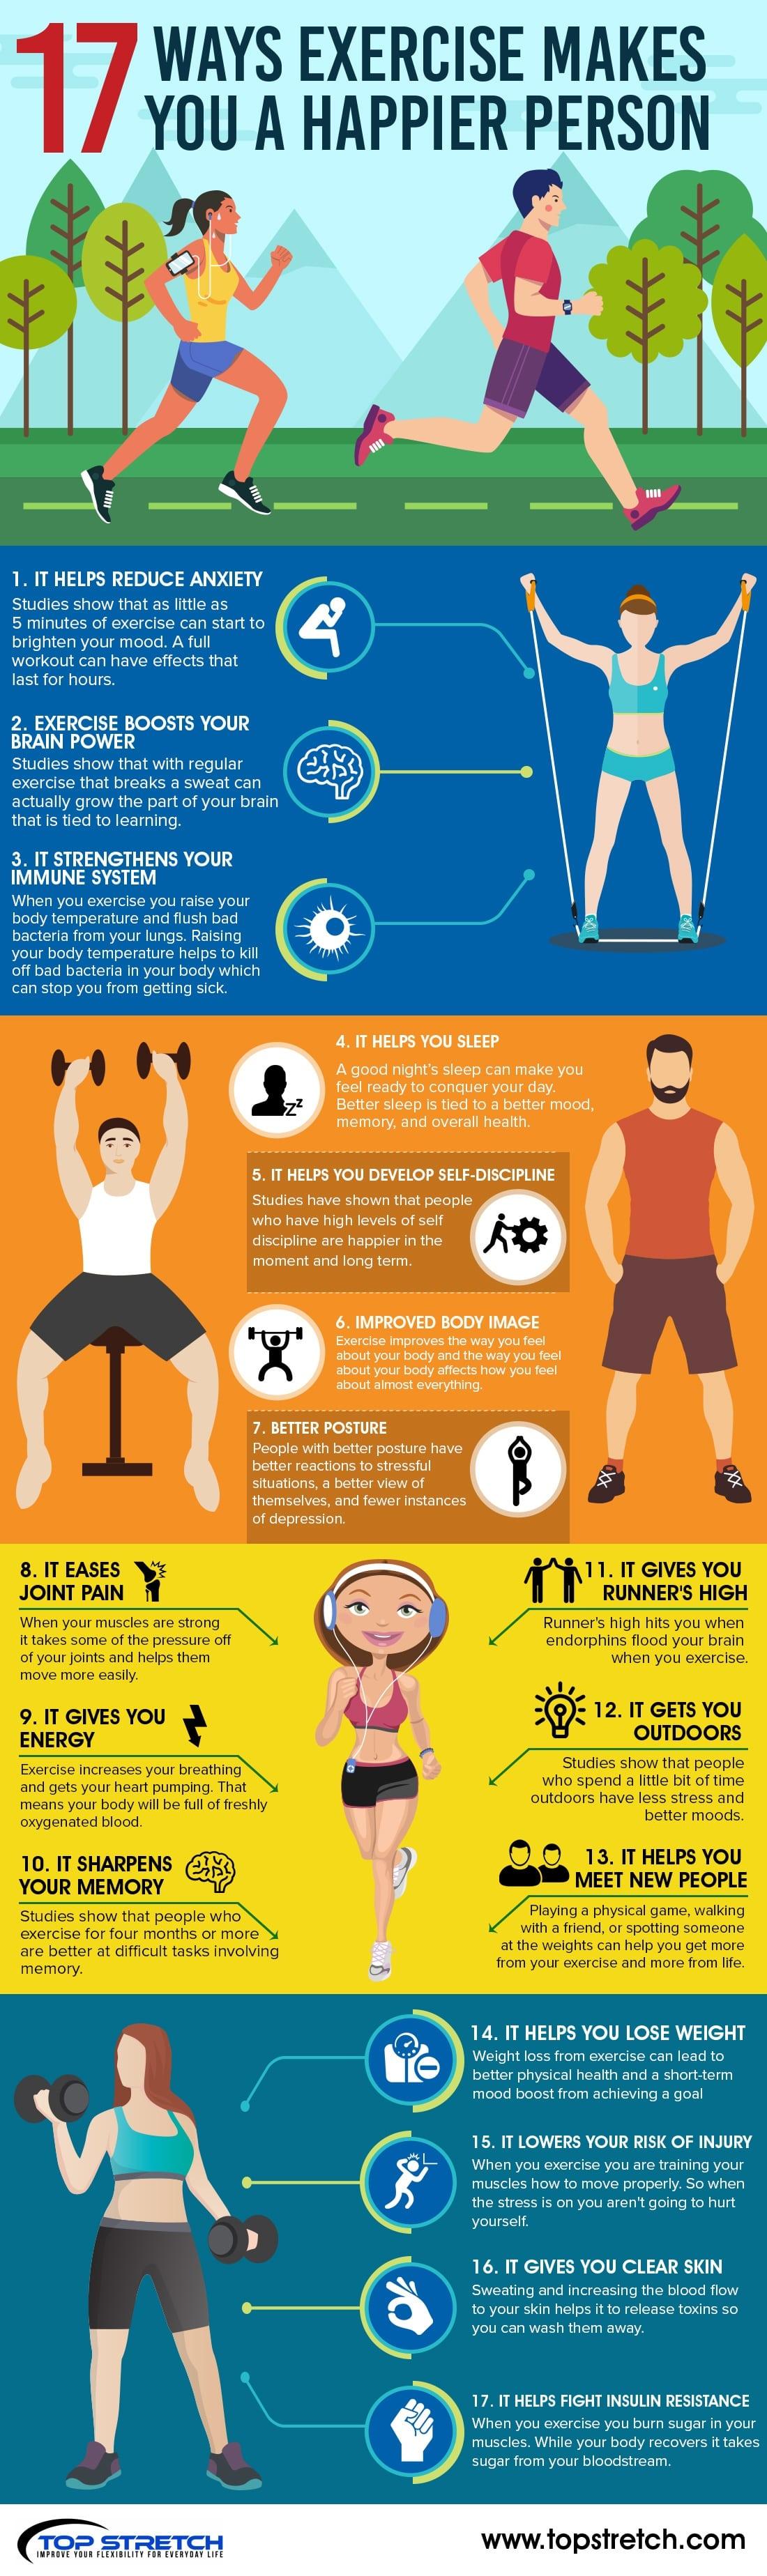 fitnessinfographic31